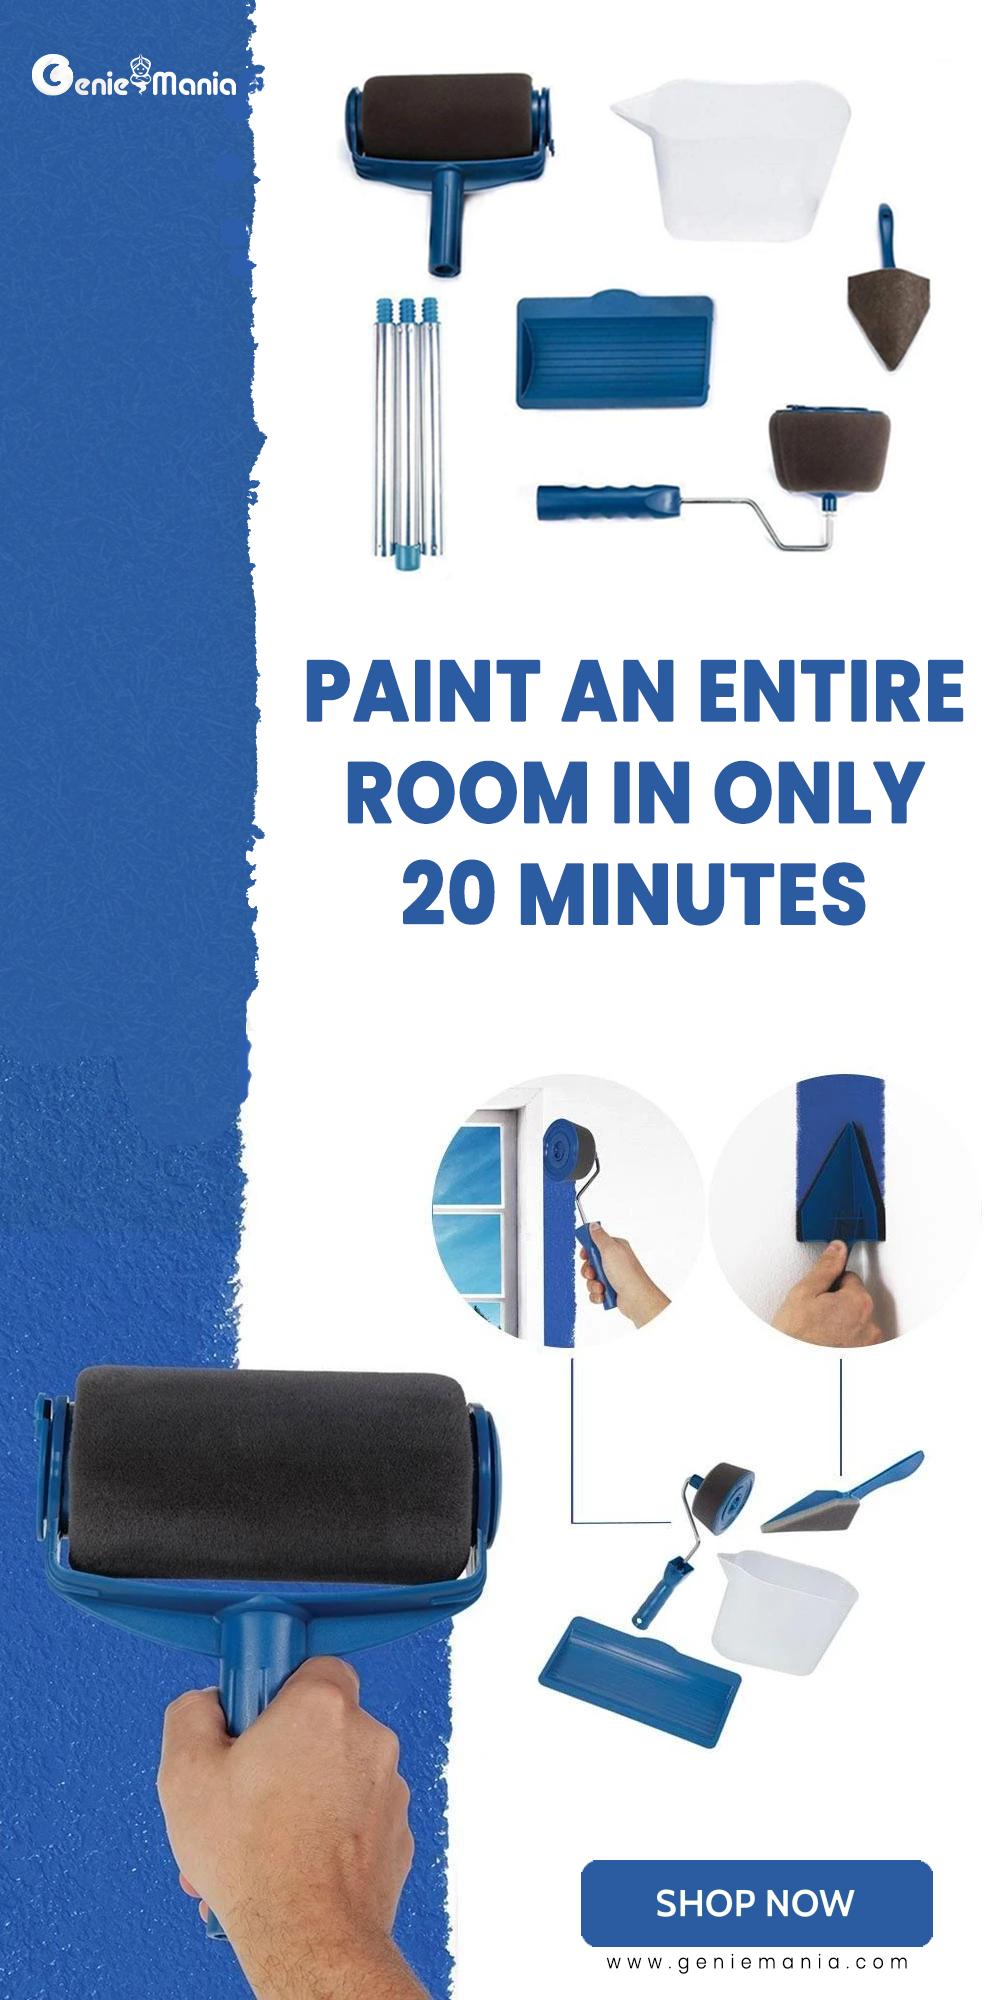 Paint Roller Brush Painting Handle Tool Paint Roller Diy Home Repair Home Decor Hacks